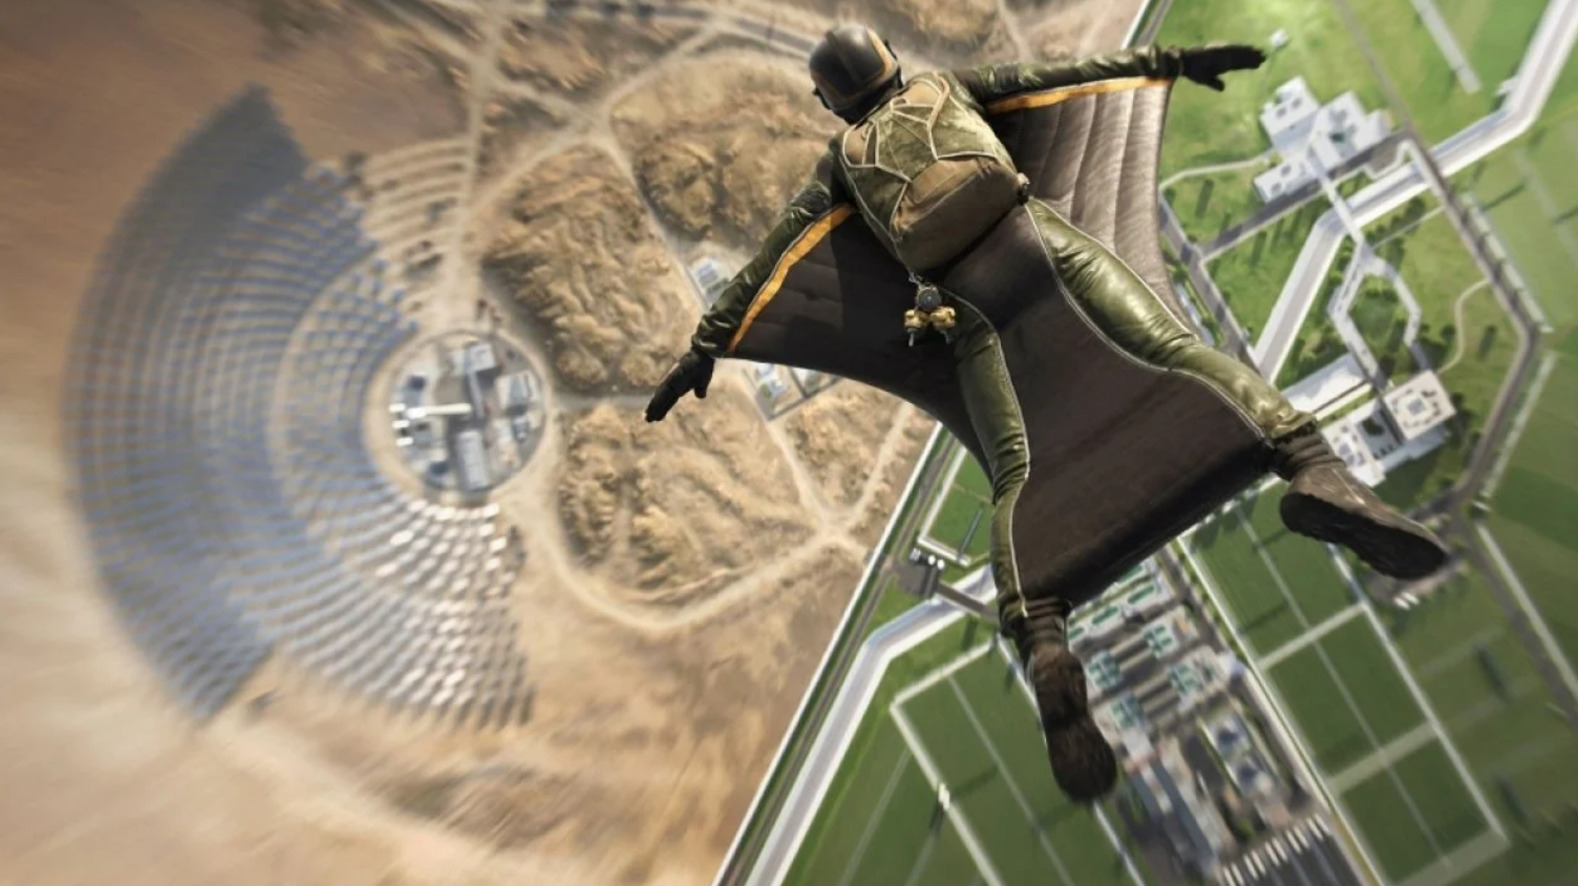 purchase battlefield 2042 game code online